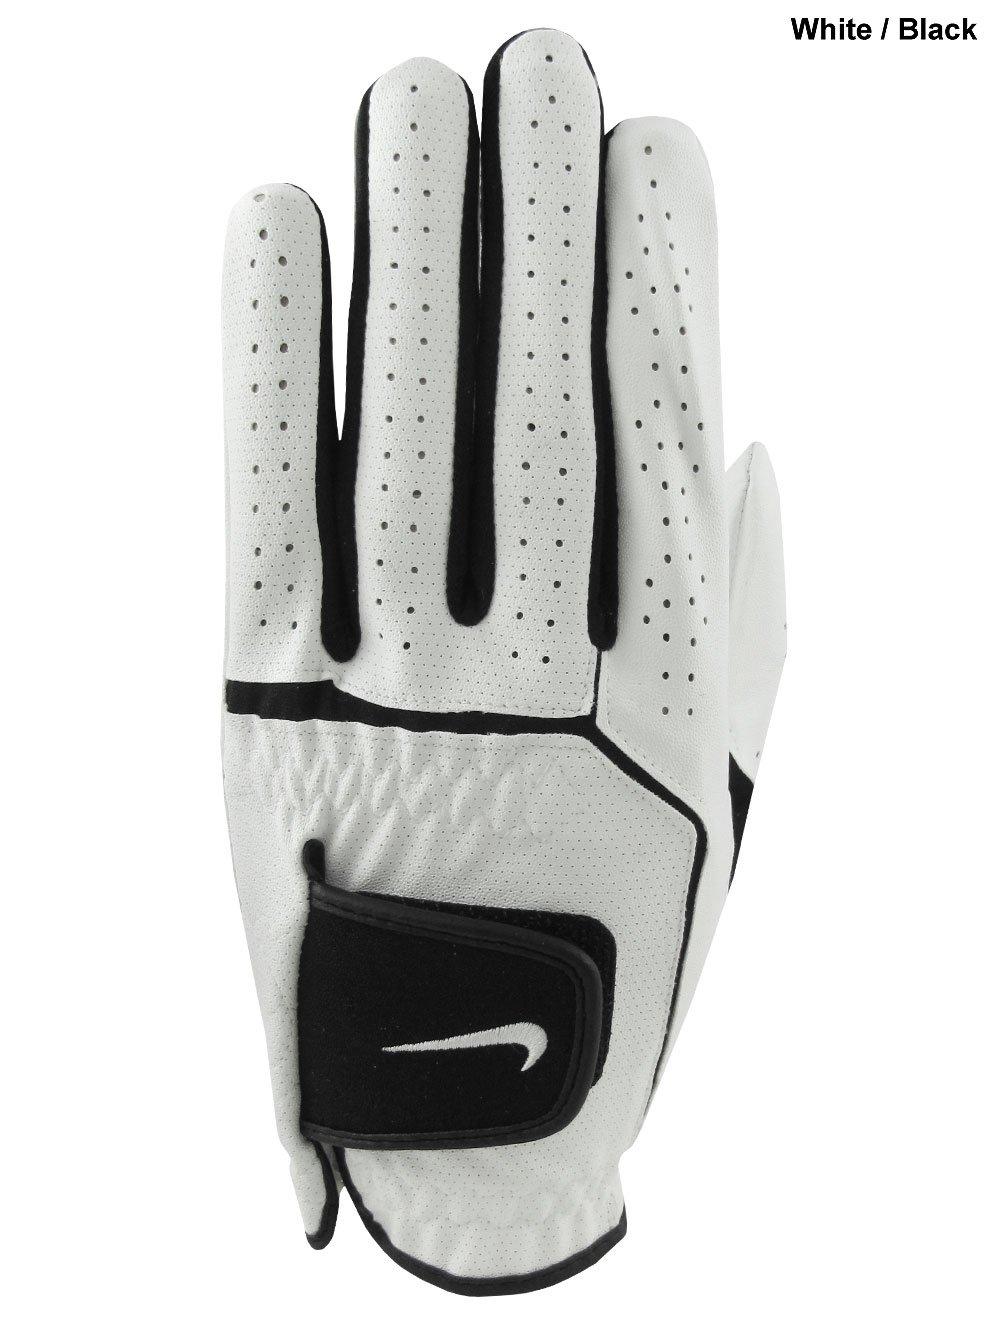 NikeゴルフDura Feel VI 2 - Pack Regular Glove (左)、スモール、ホワイト/ブラック   B007PZXWO4